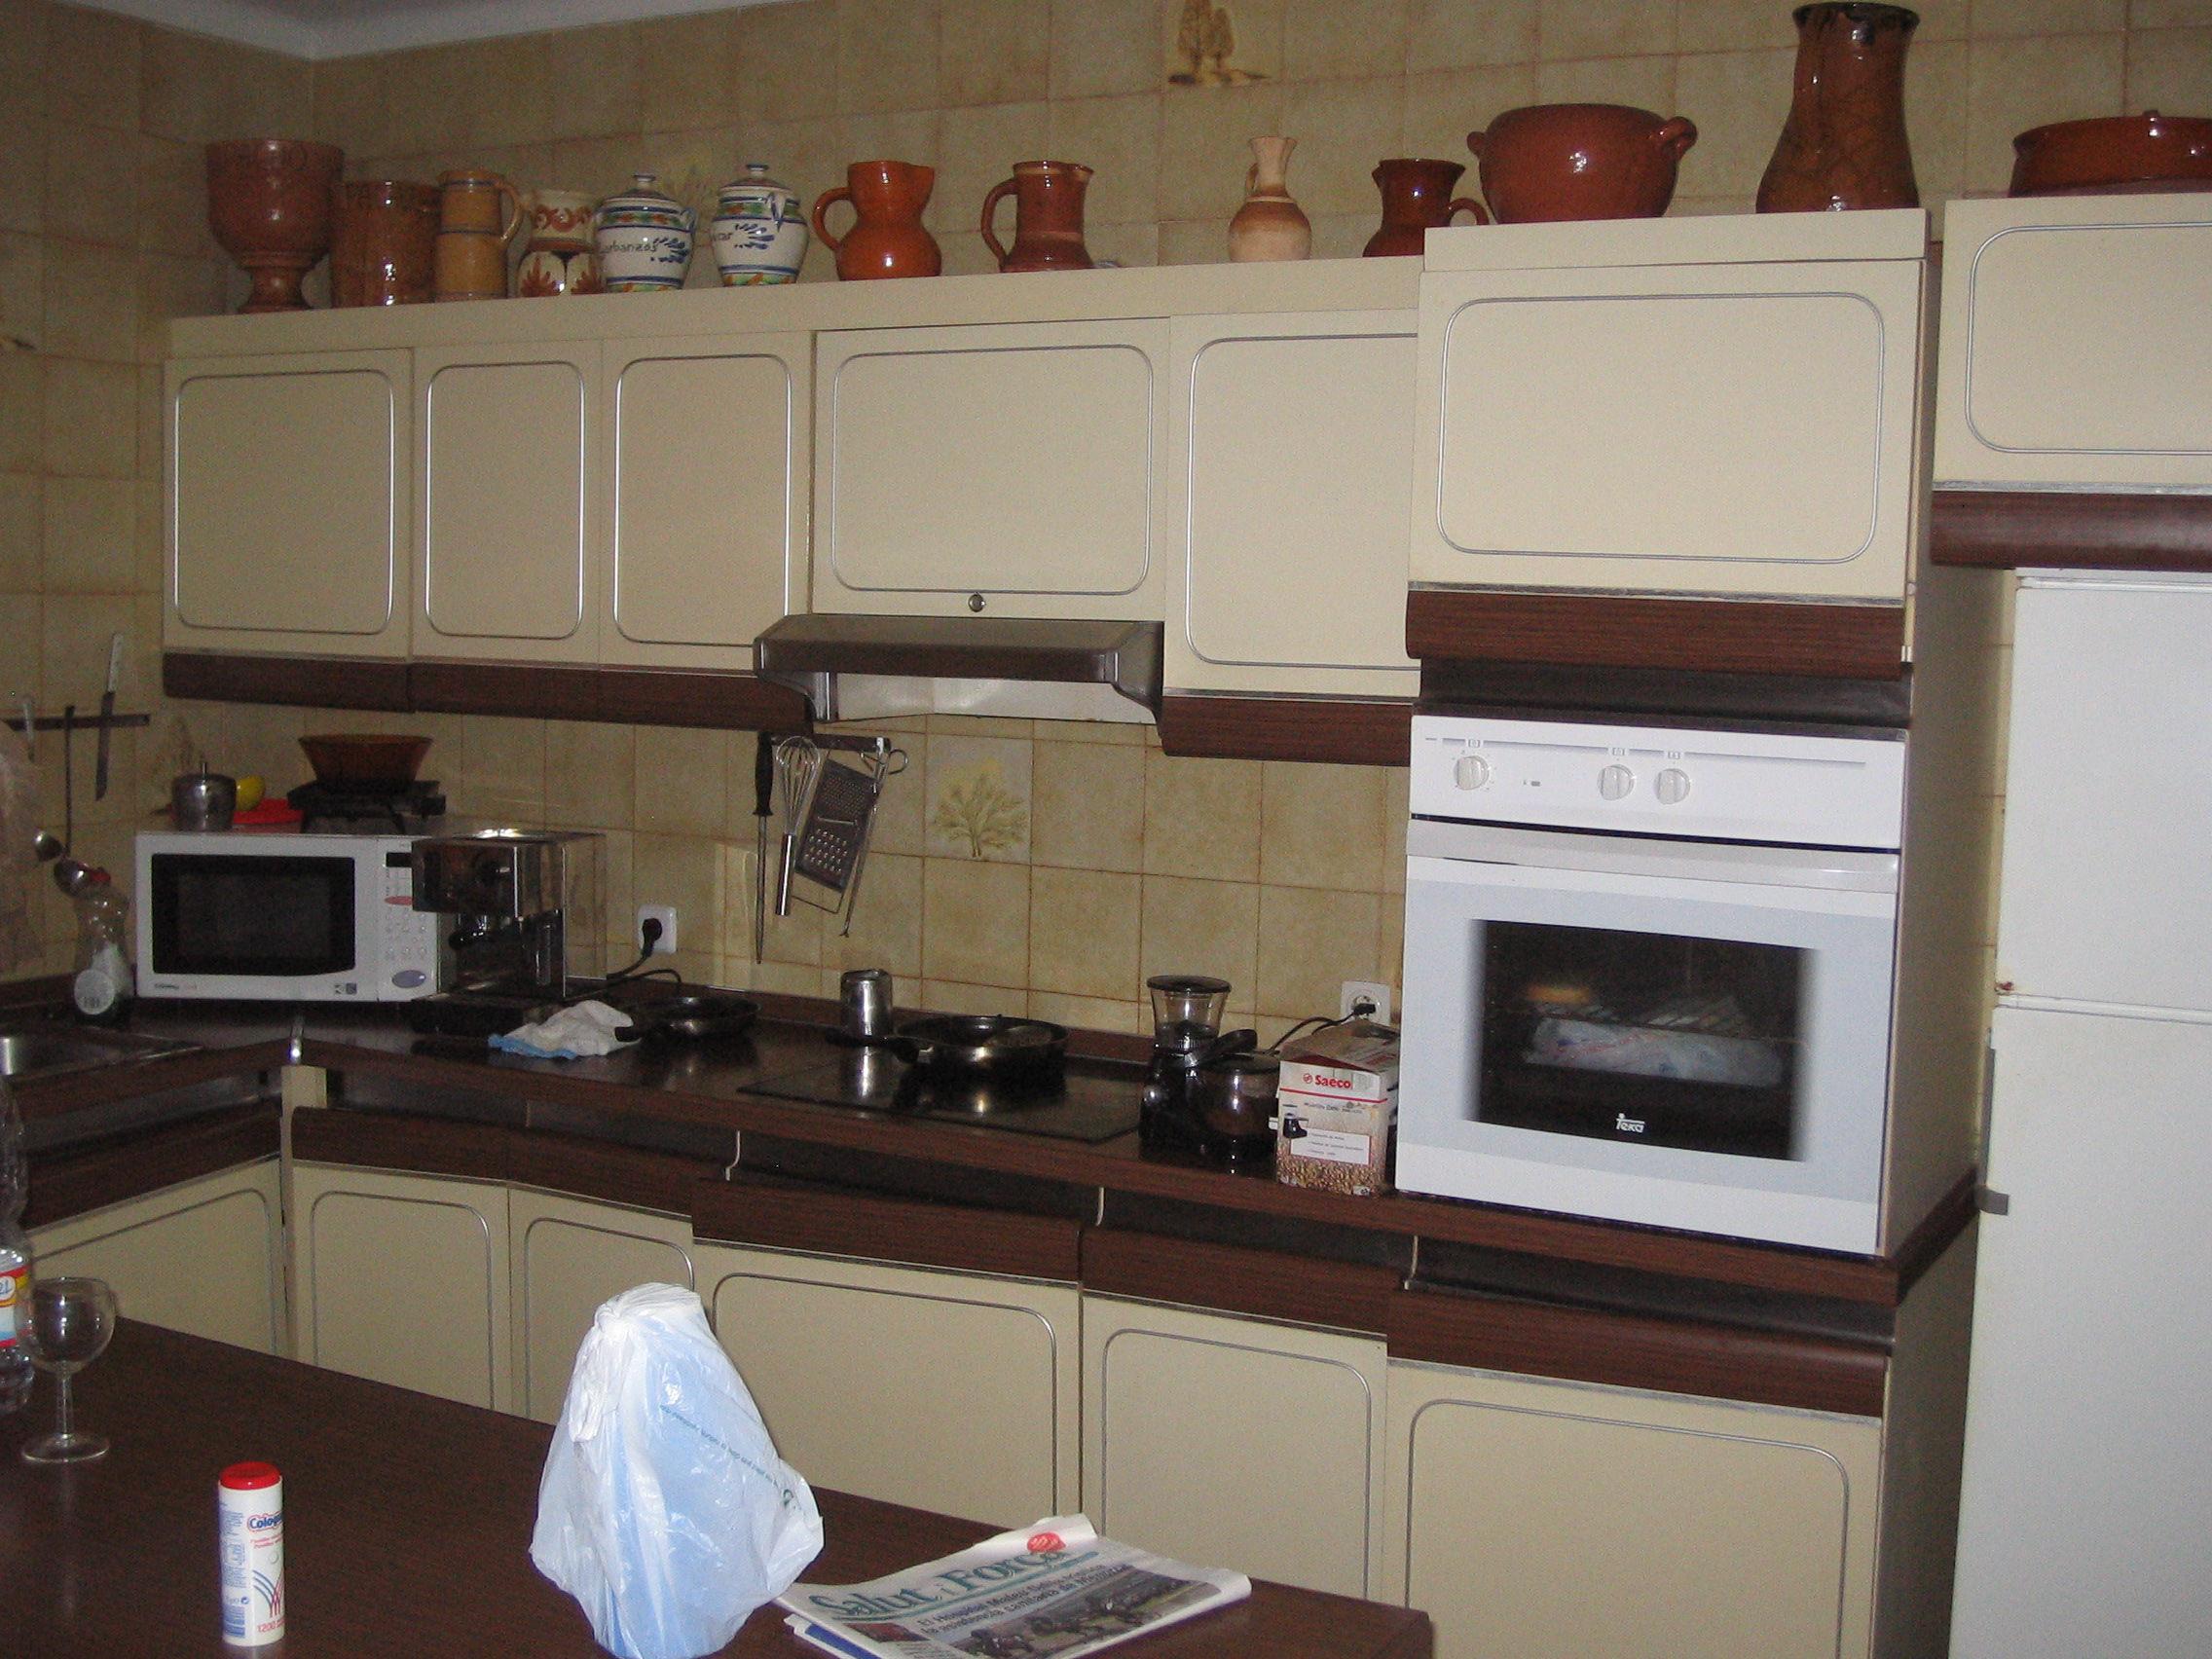 File cocina rafax jpg wikimedia commons - Como limpiar azulejos cocina ...